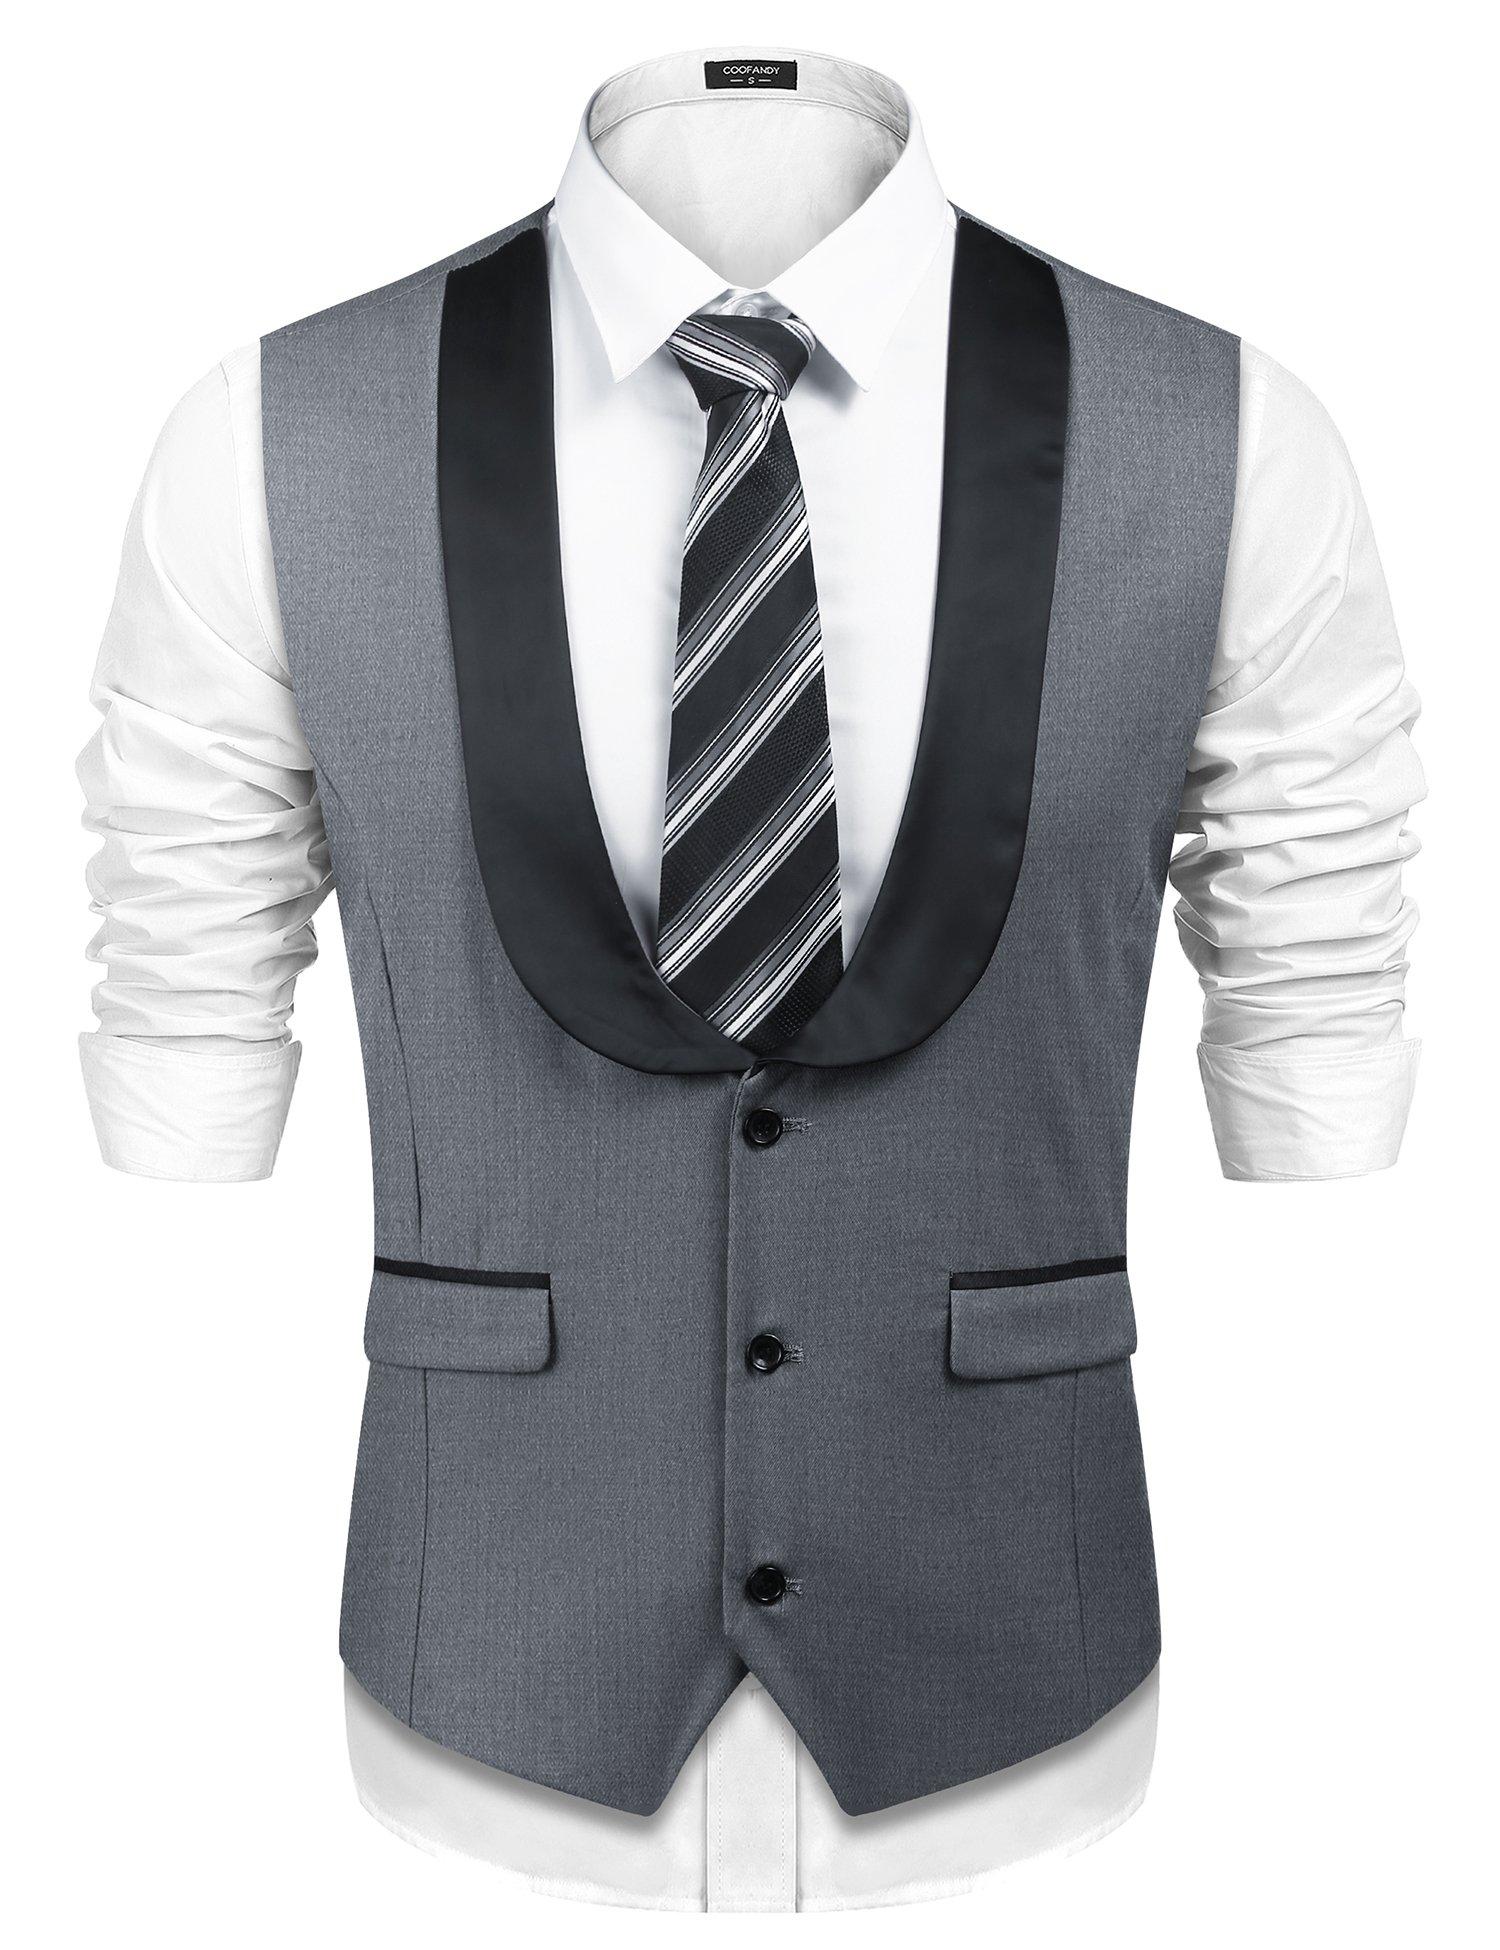 COOFANDY Mens Business Dress Suit Button Down Wedding Vest Waistcoat,Gray,X-Large